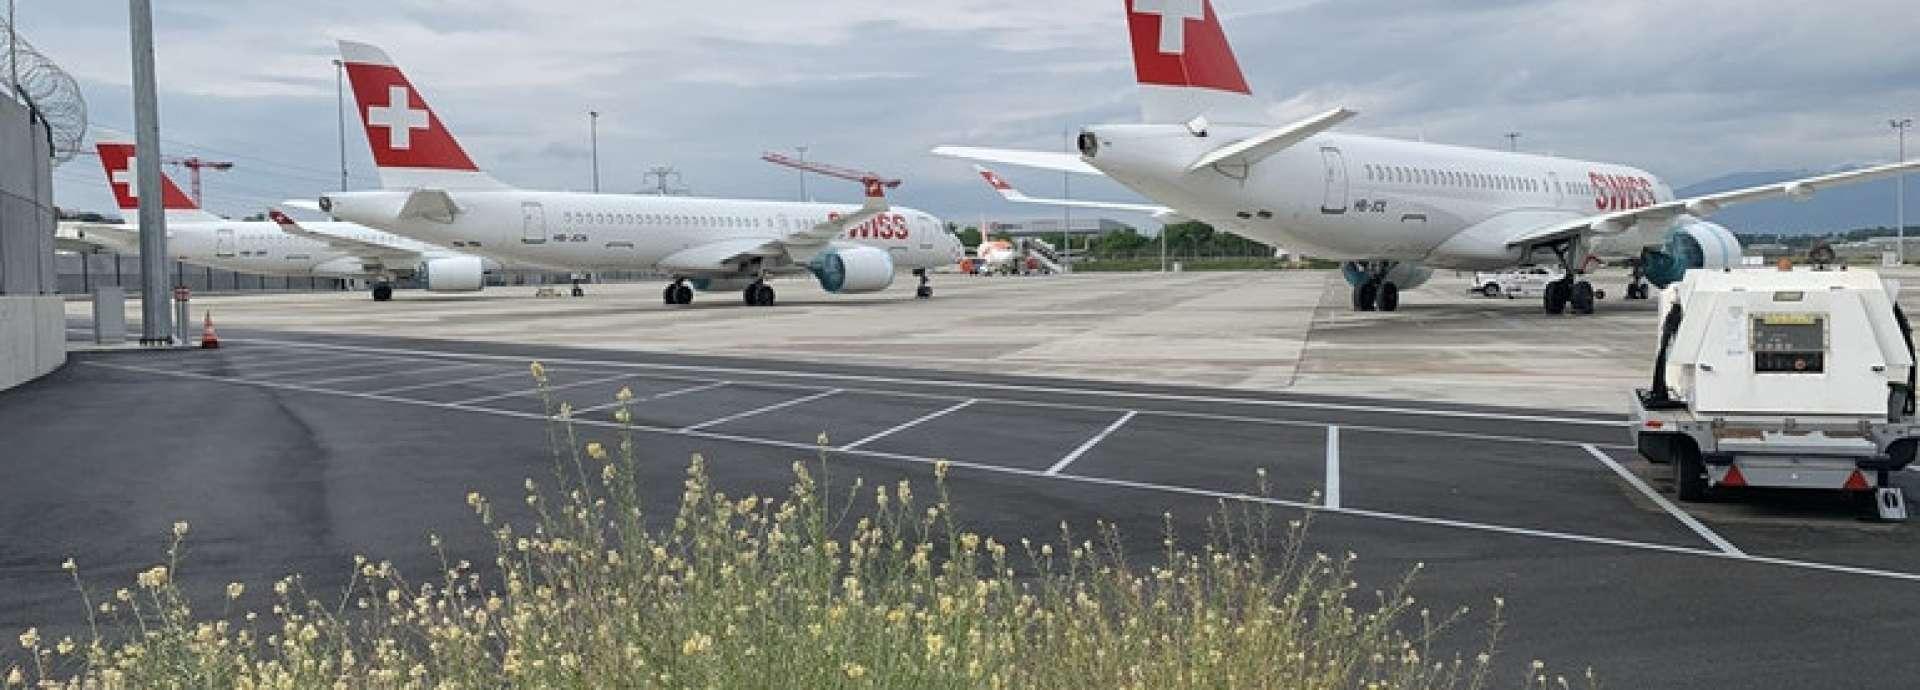 Aeroport-de-geneve-1